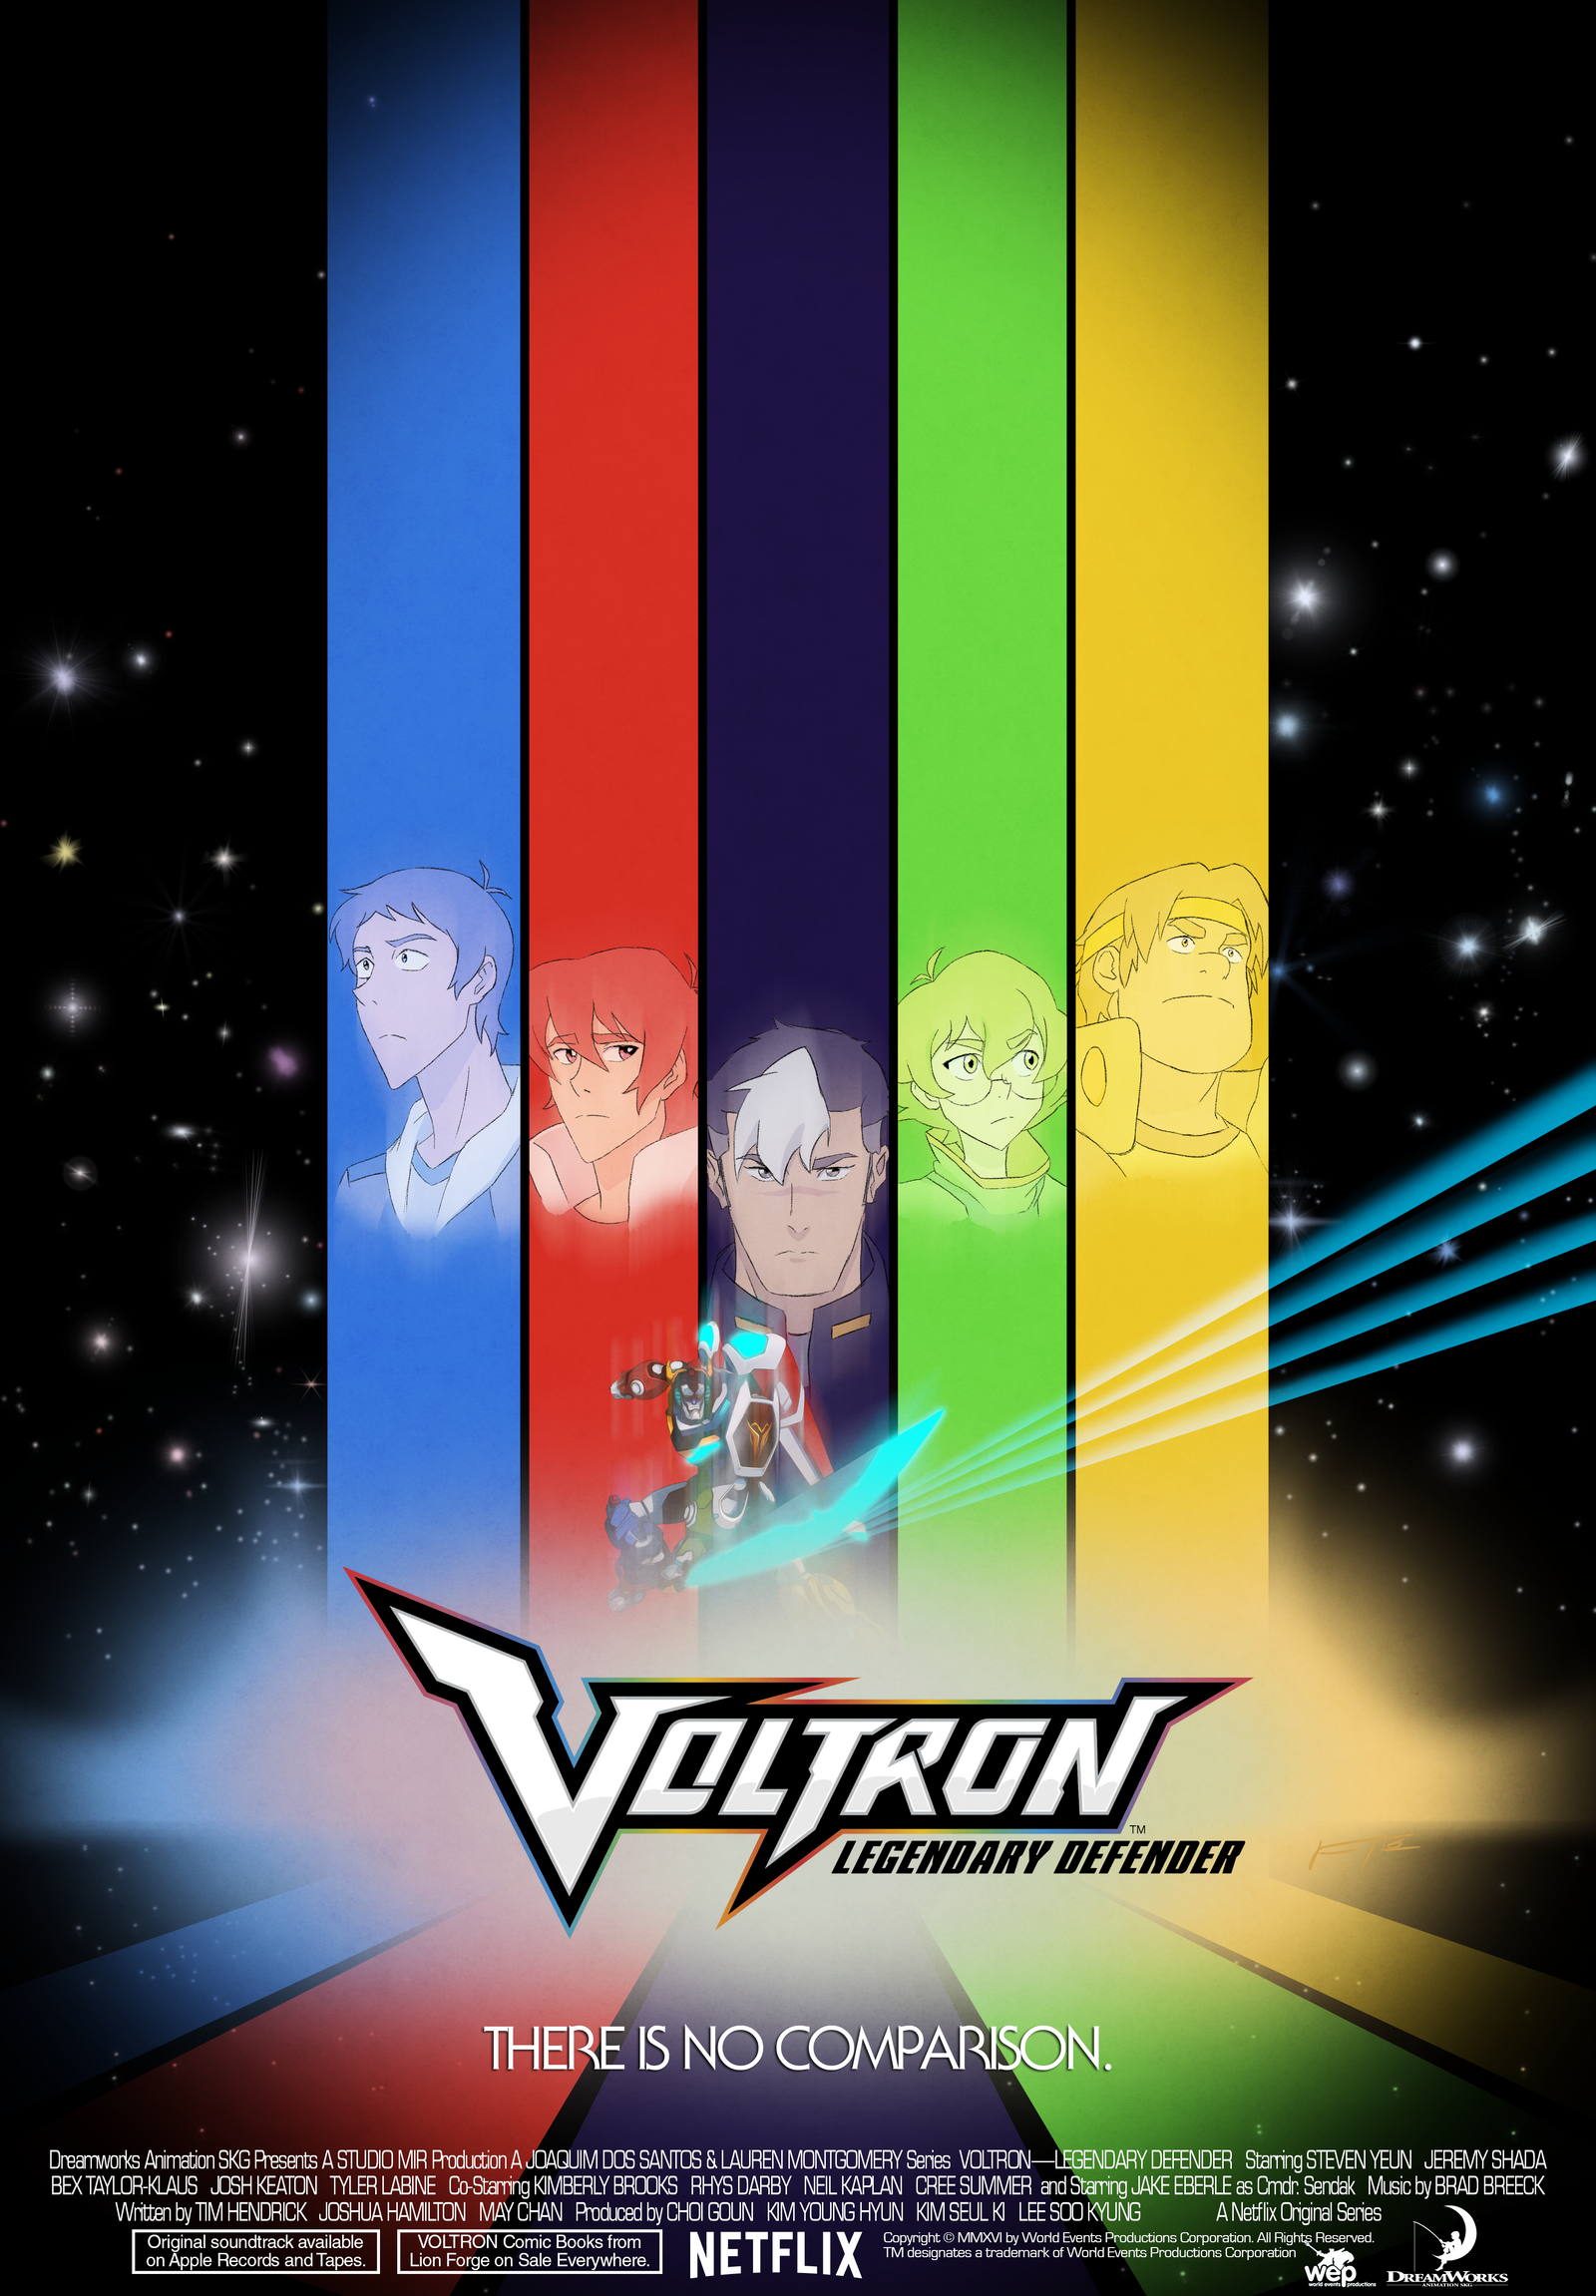 Voltron:LD Retro-ish Poster by FrankRT